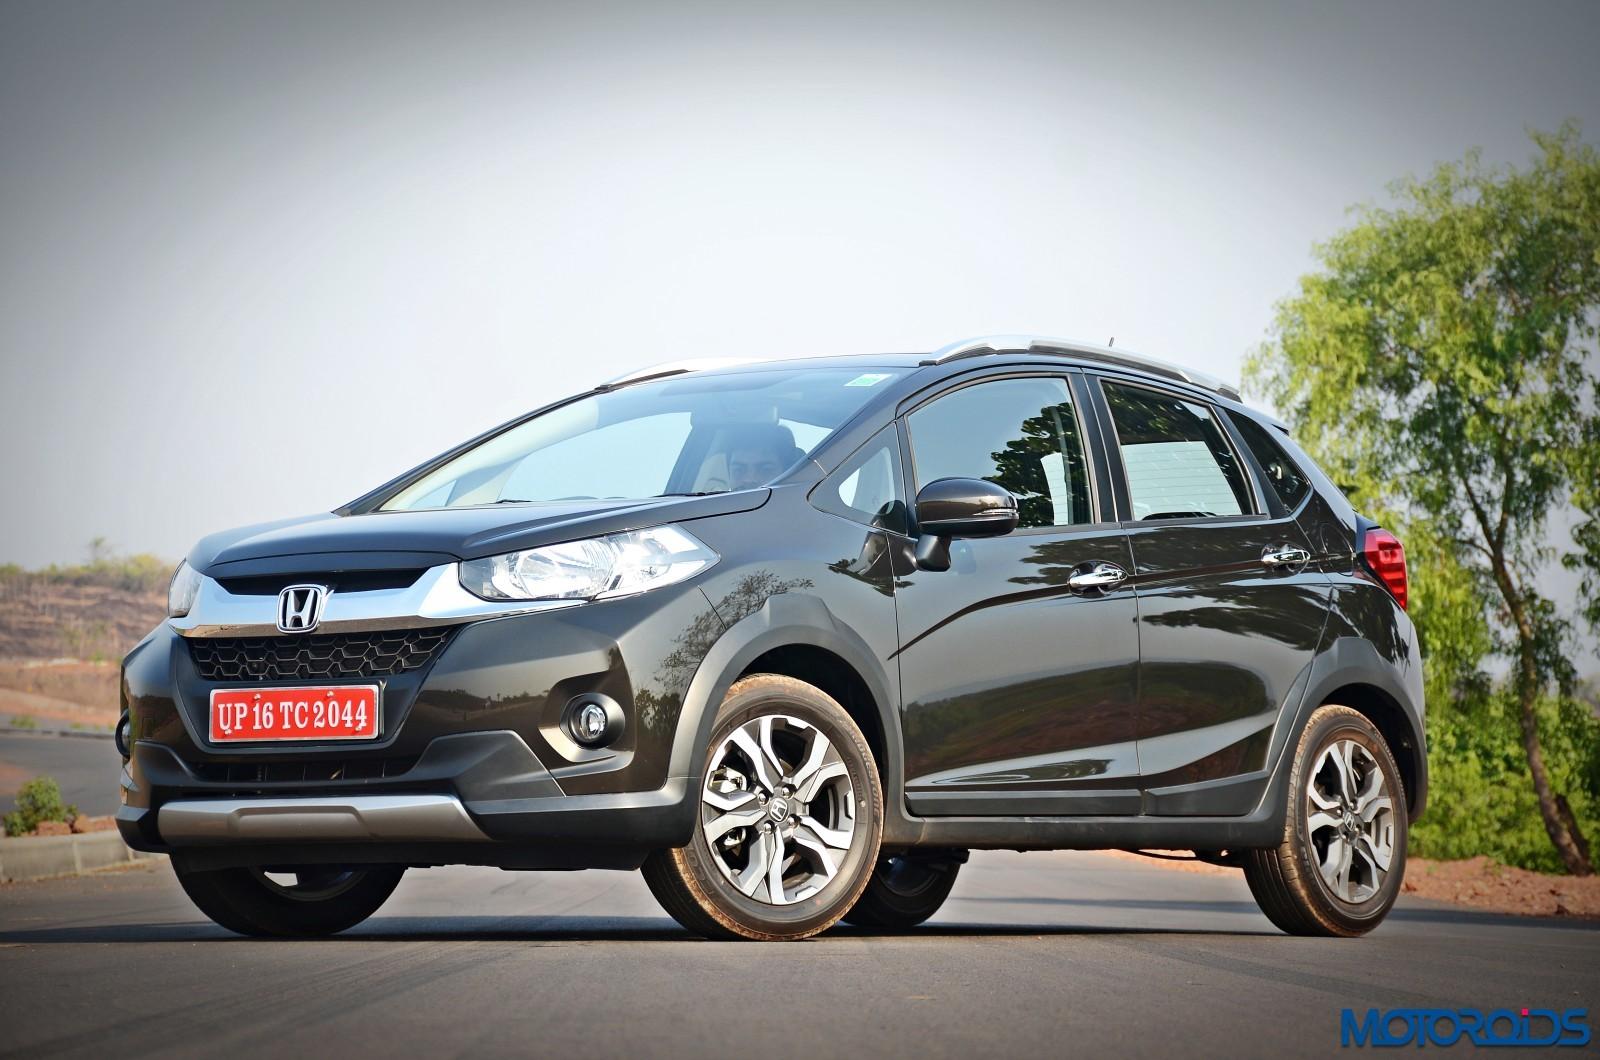 New Honda WR-V India Review, Price, Specs, Mileage, Image ...